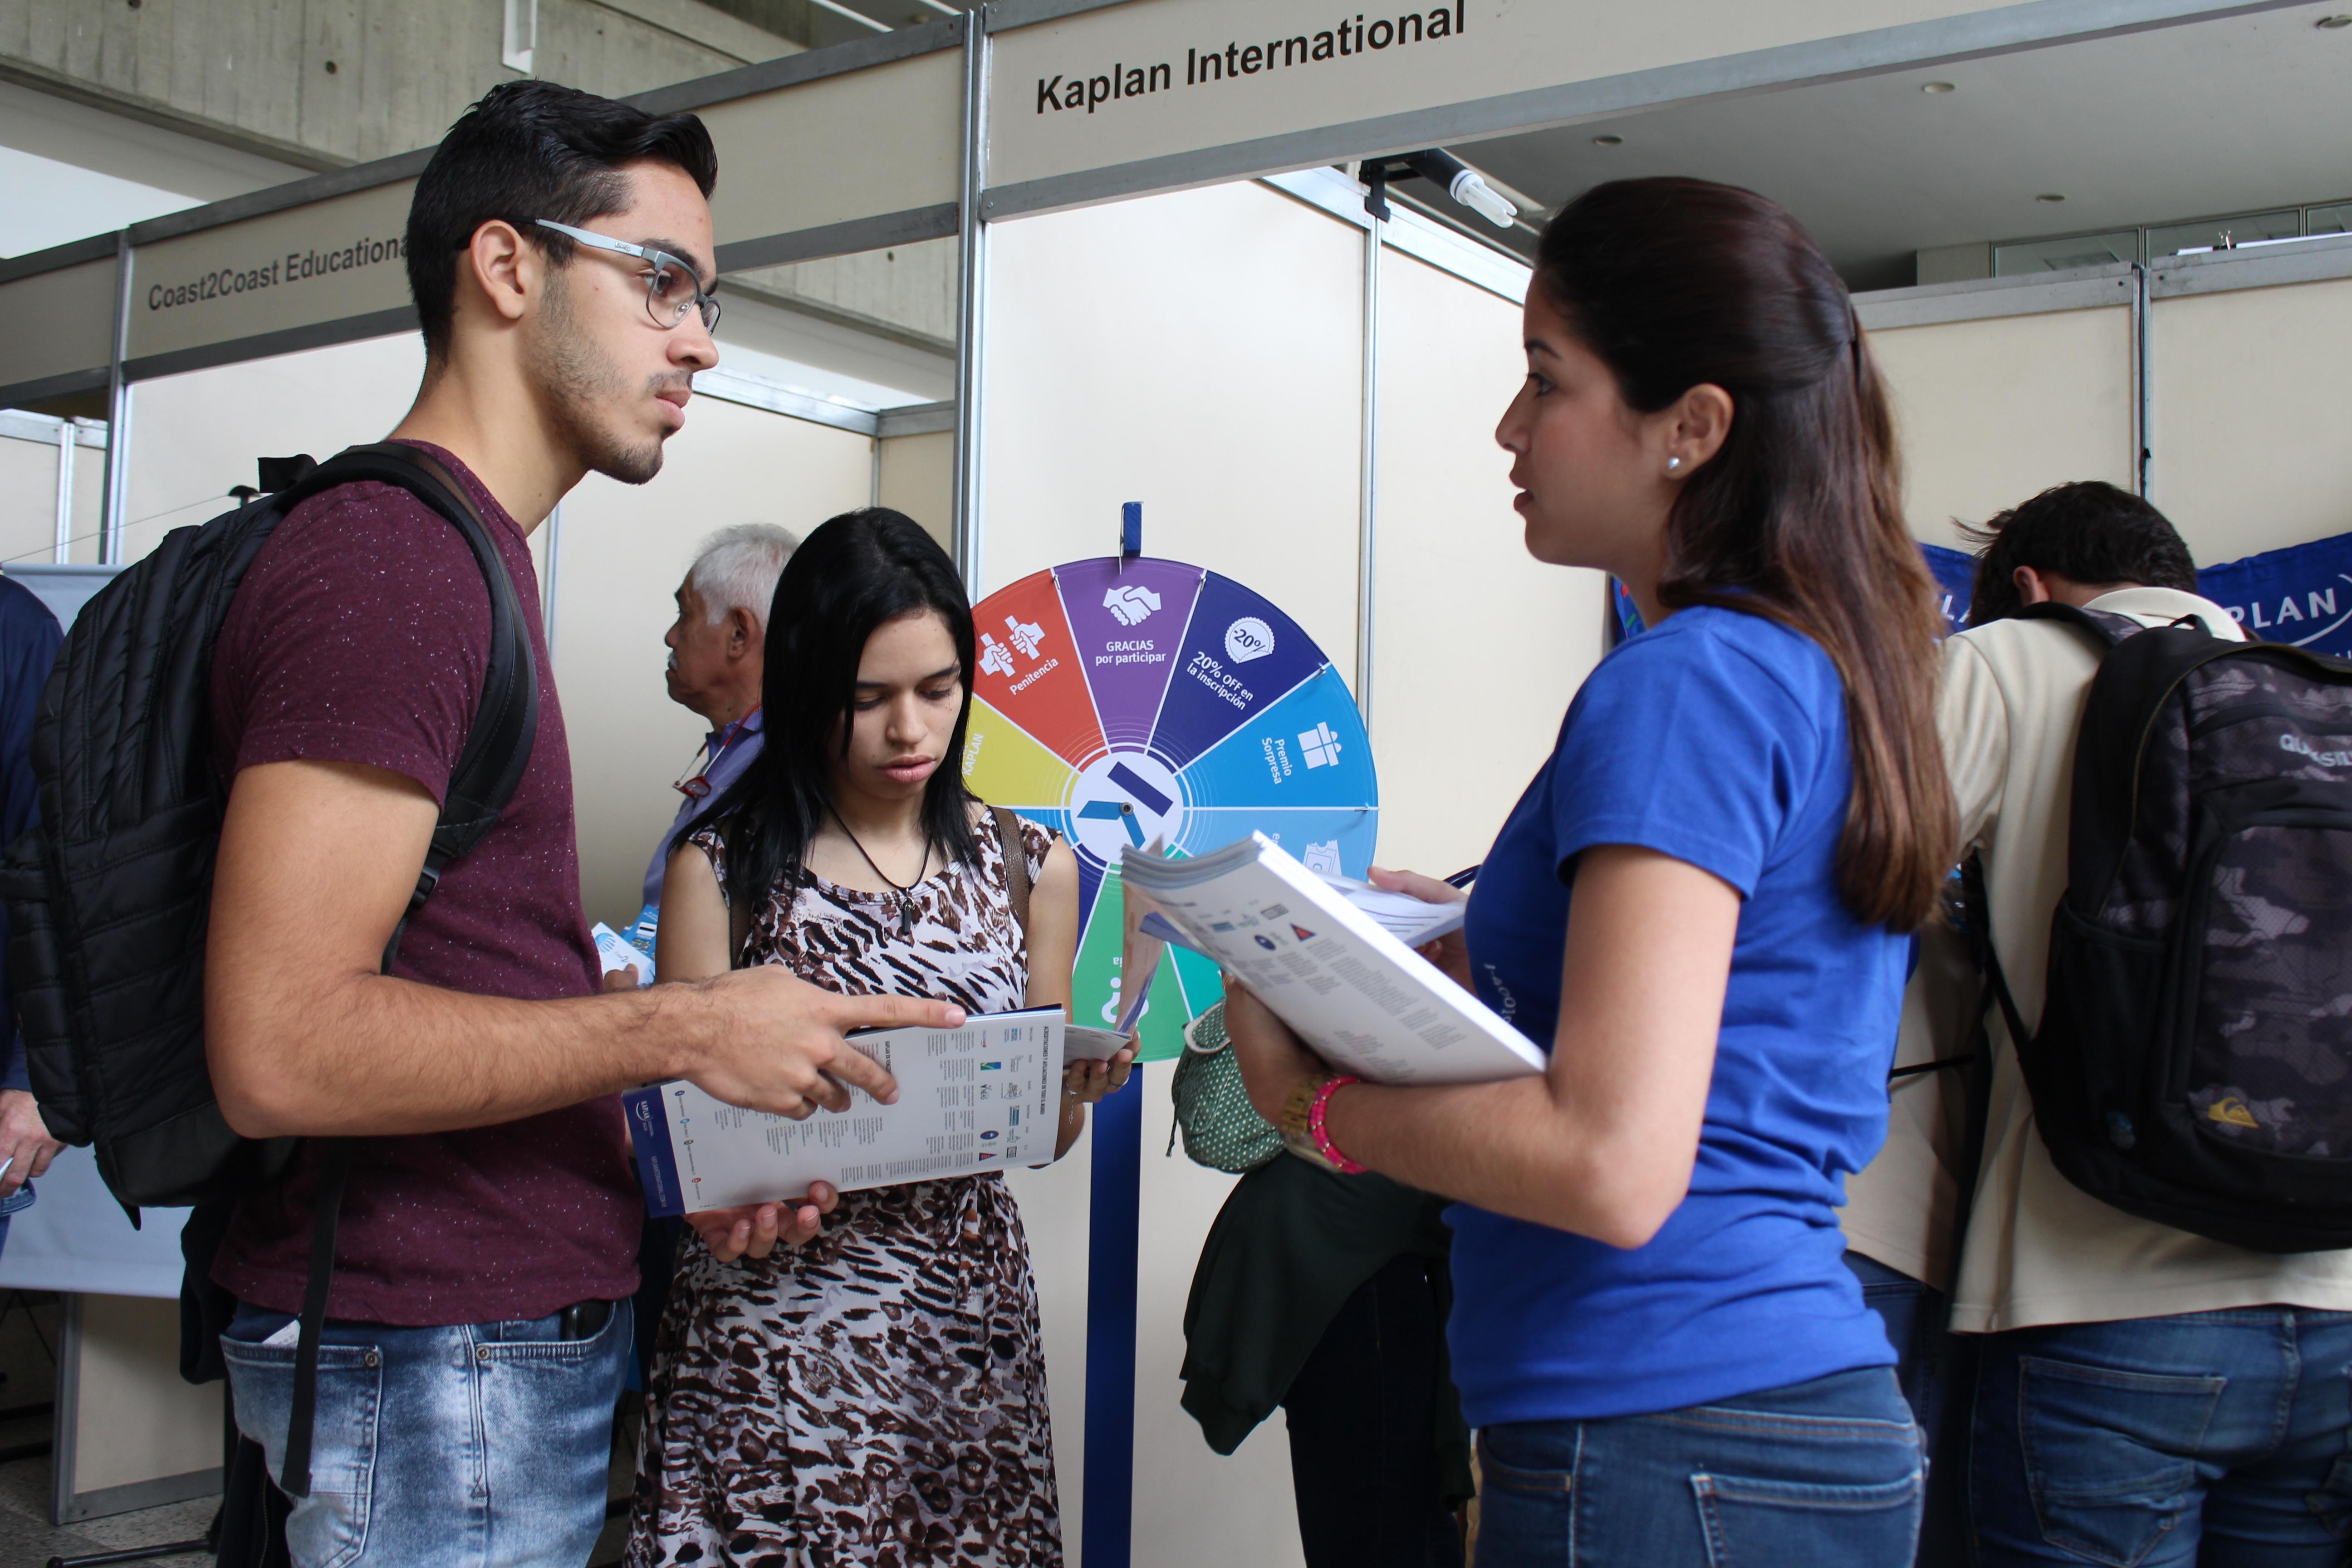 Regresa la Feria de Oportunidades de Estudio en el Exterior